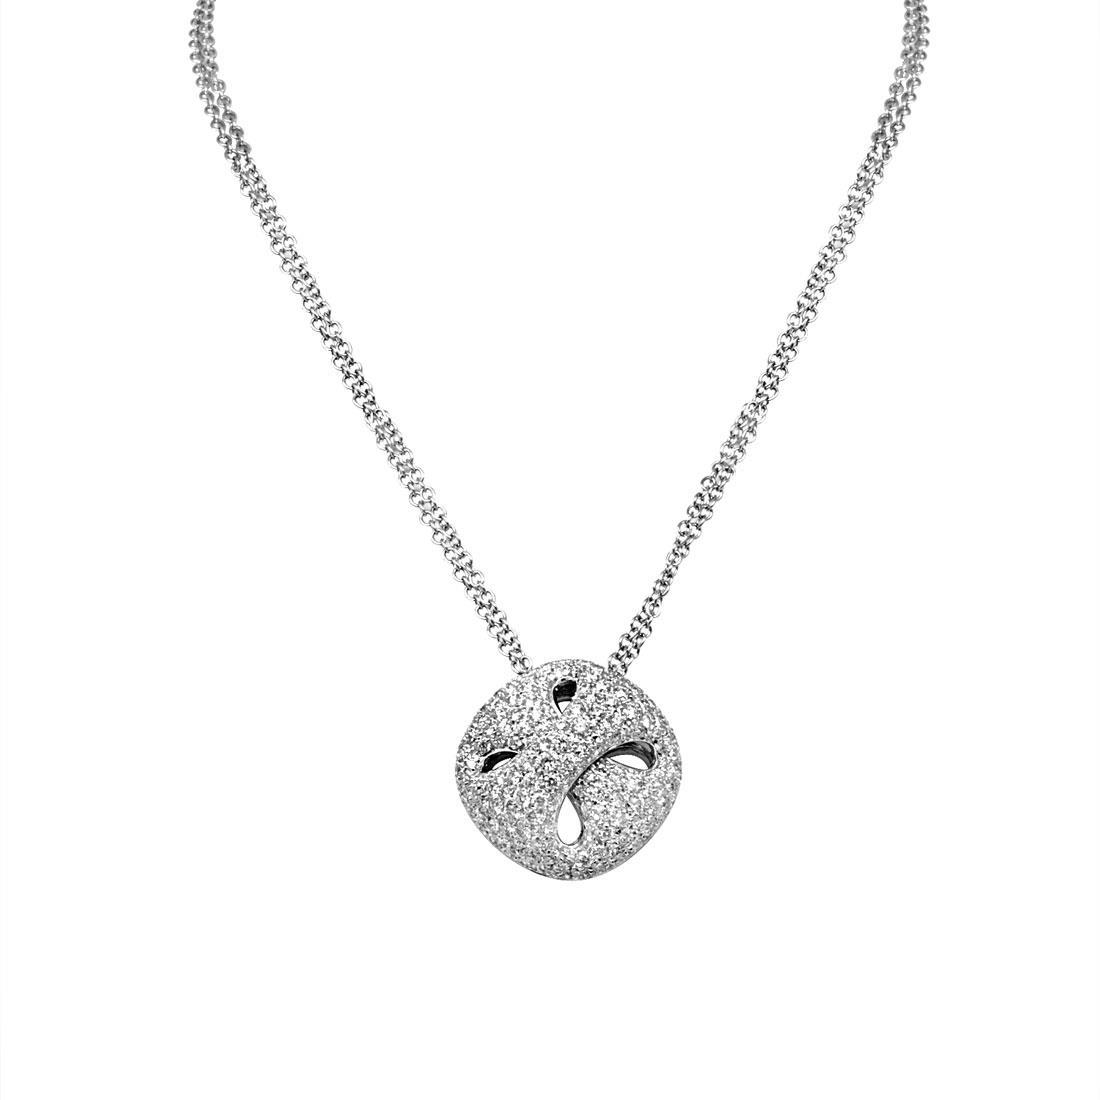 Collier Damiani in oro bianco con diamanti ct 2,22 - DAMIANI